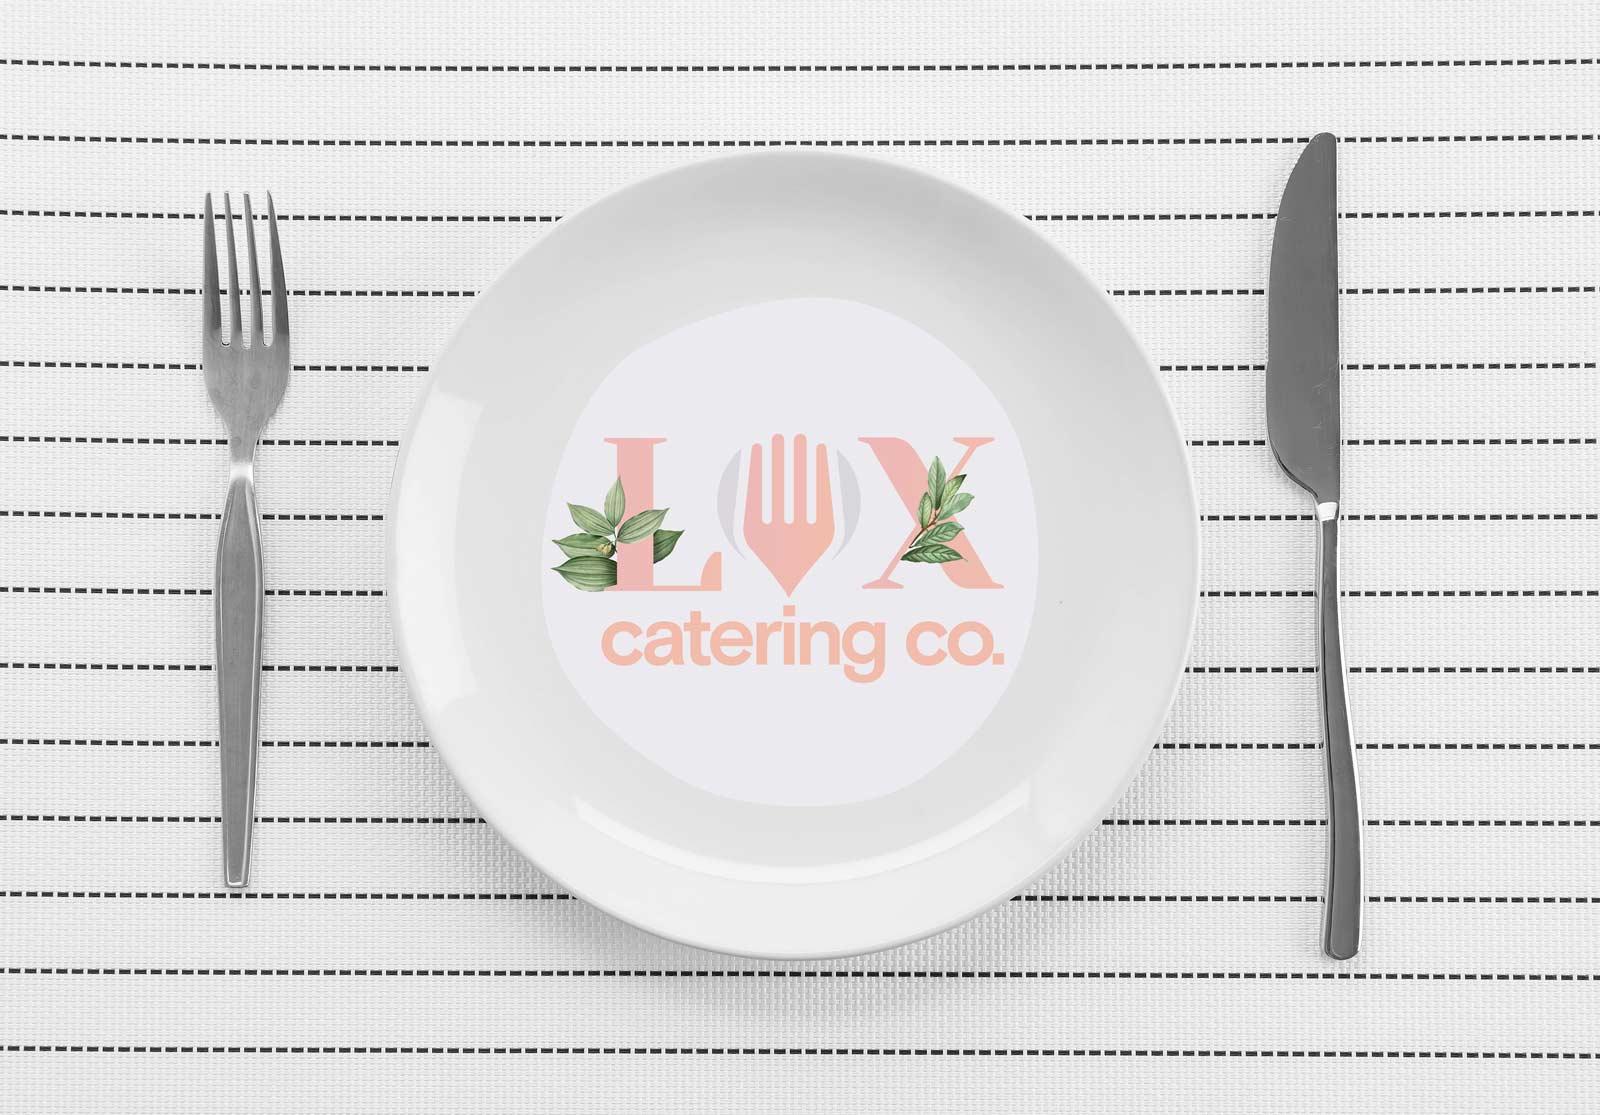 az catering